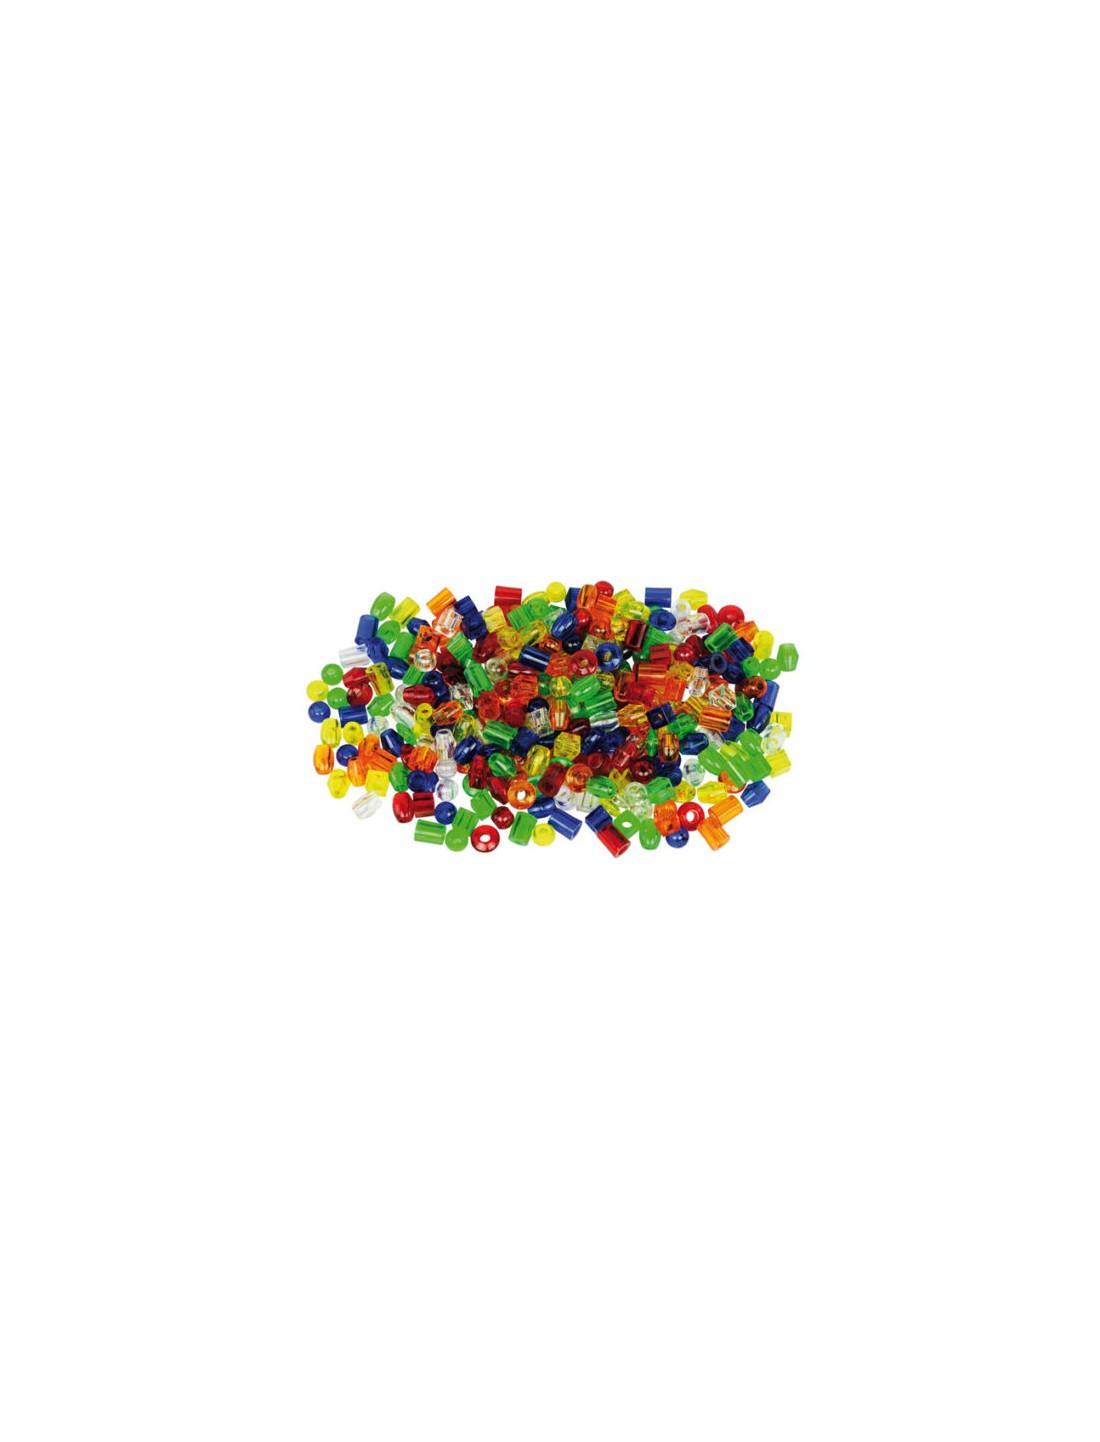 Perlas traslúcidas enlazables. TickiT